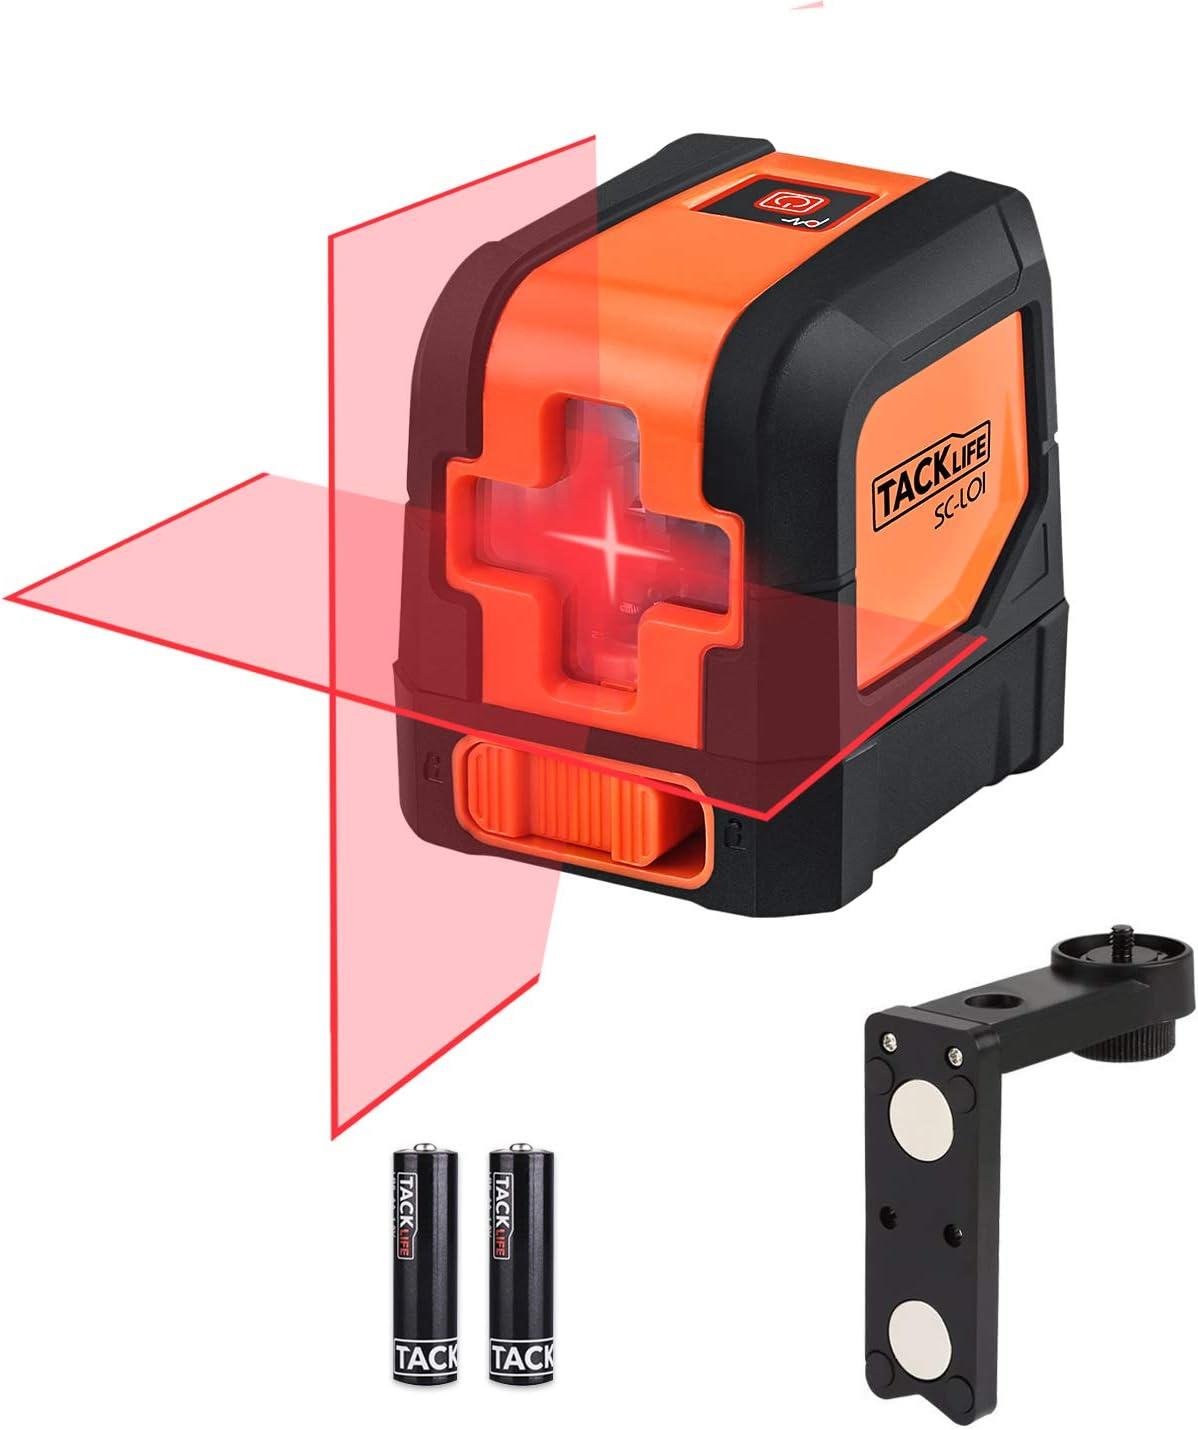 3. Tacklife SC-L01-50 Feet Laser Level